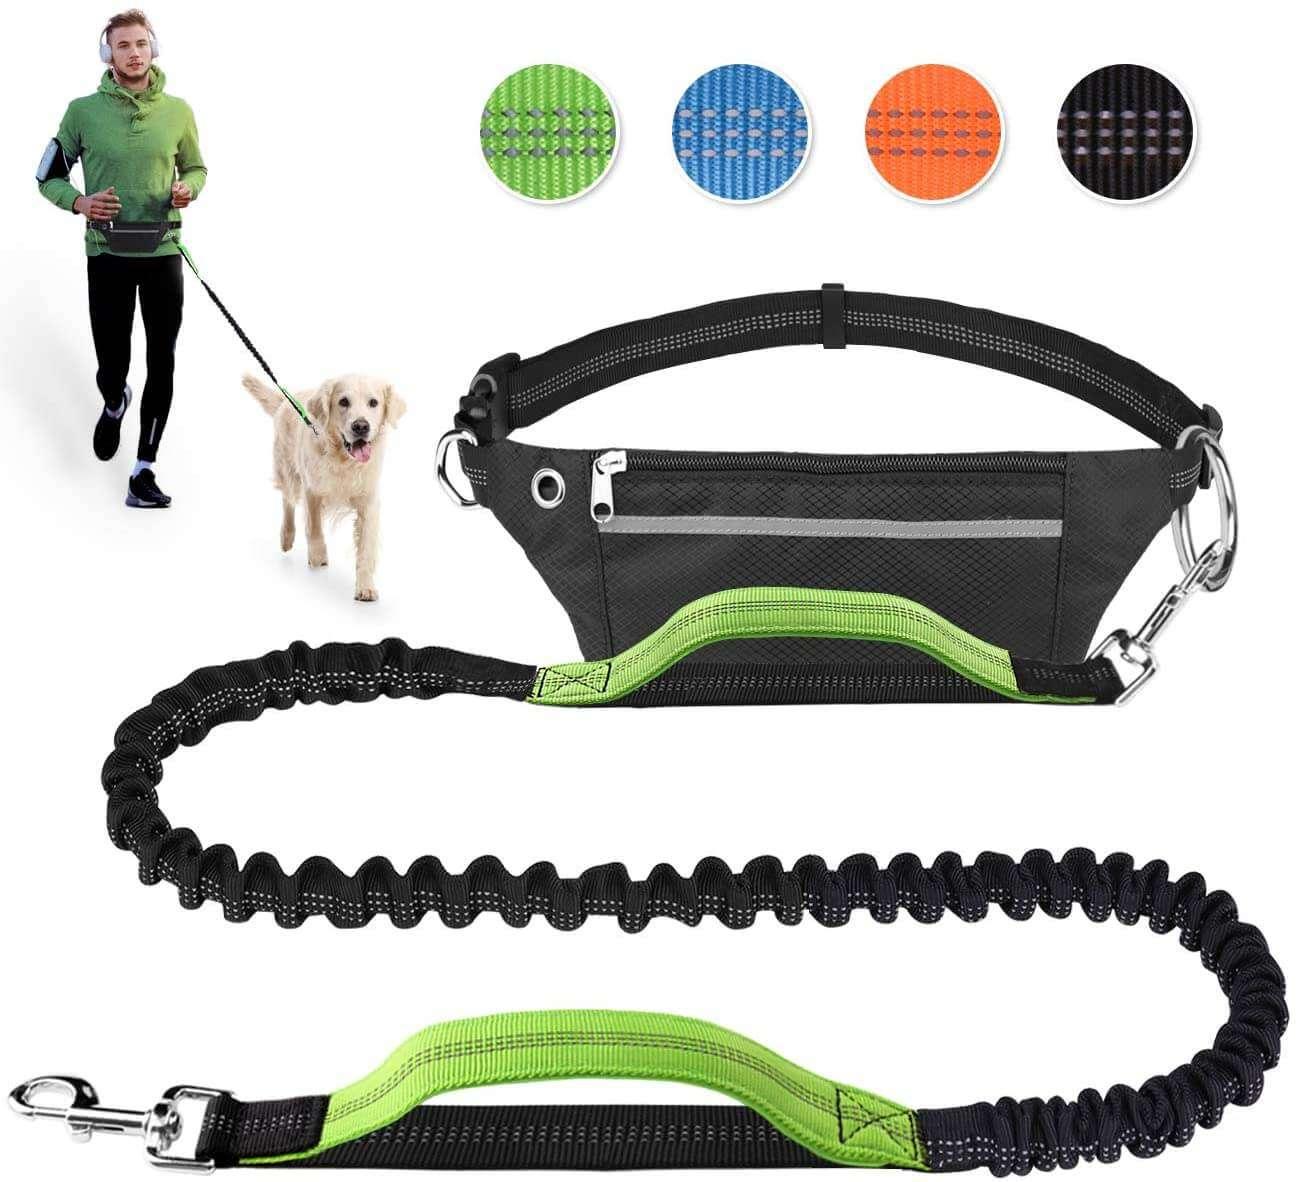 dog leash - hands-free